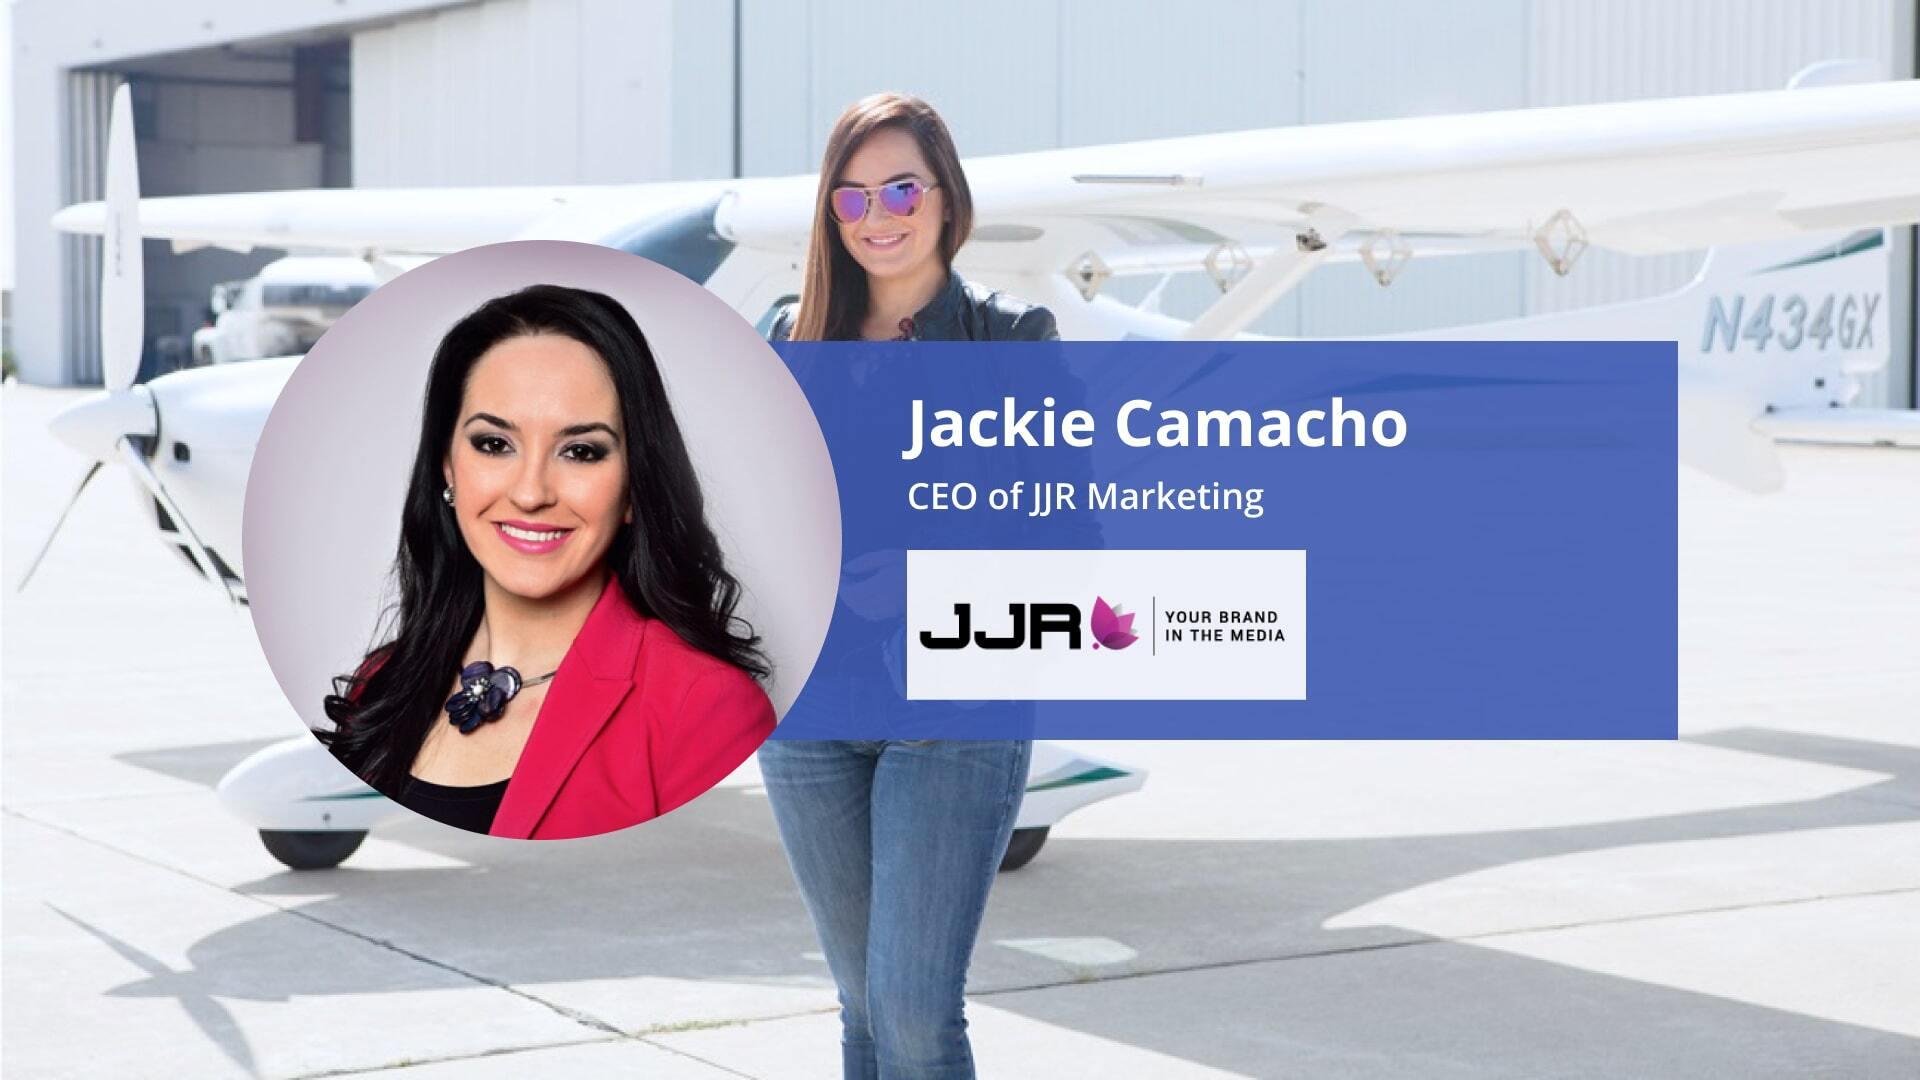 Blue Ocean Global Technology interviews Jackie Camacho, CEO of JJR Marketing